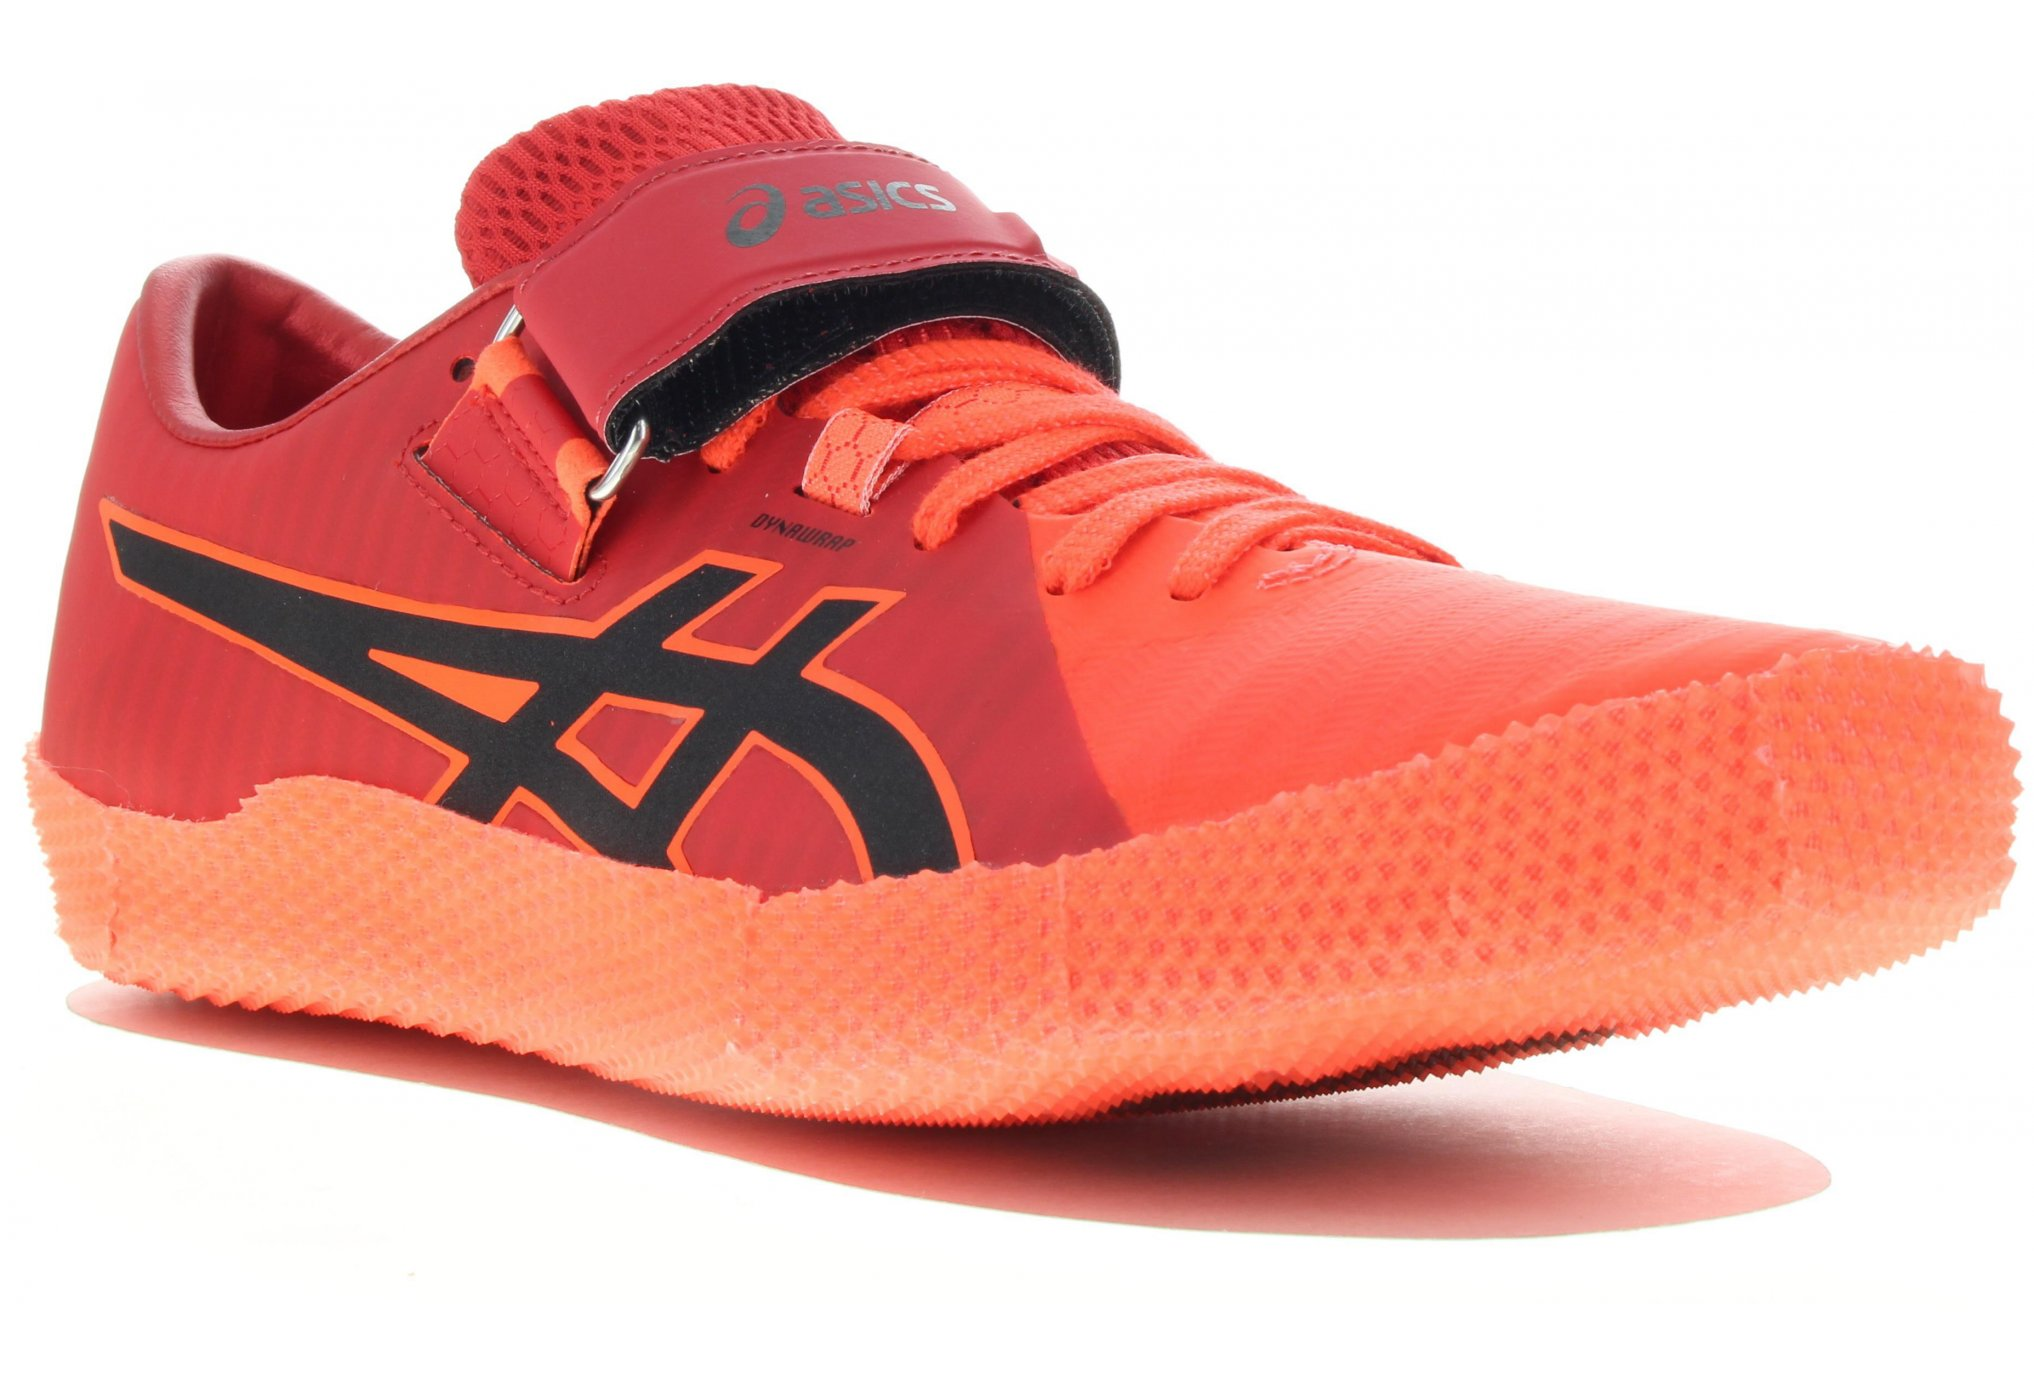 Asics High Jump Pro 2 Gauche M Diététique Chaussures homme